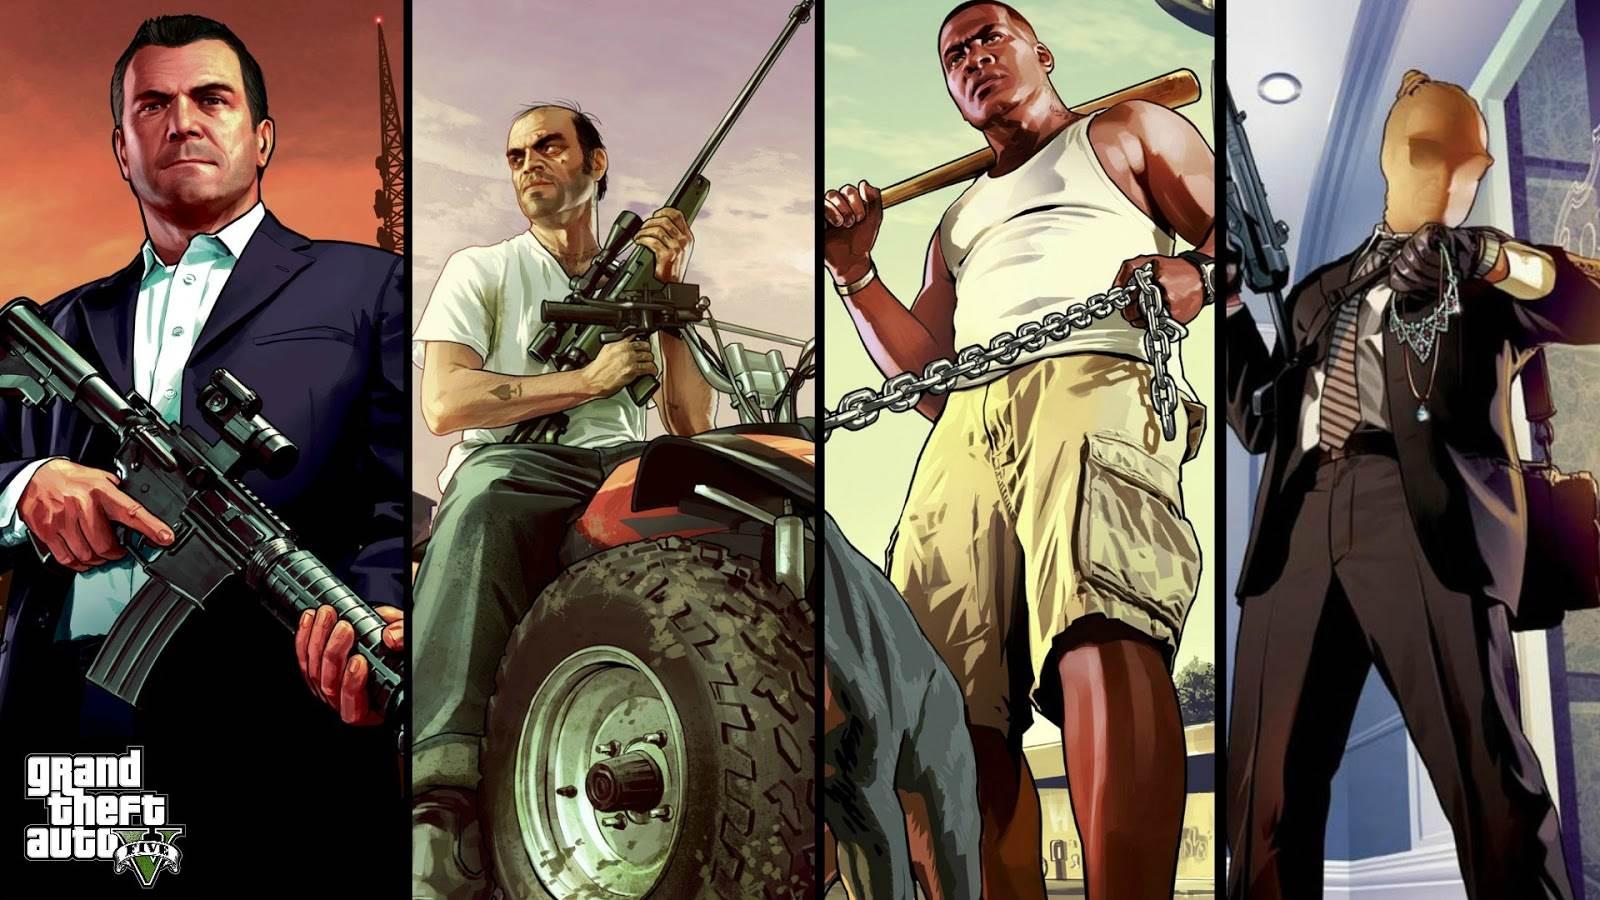 Grand Theft Auto V Wallpapers Wallpaper